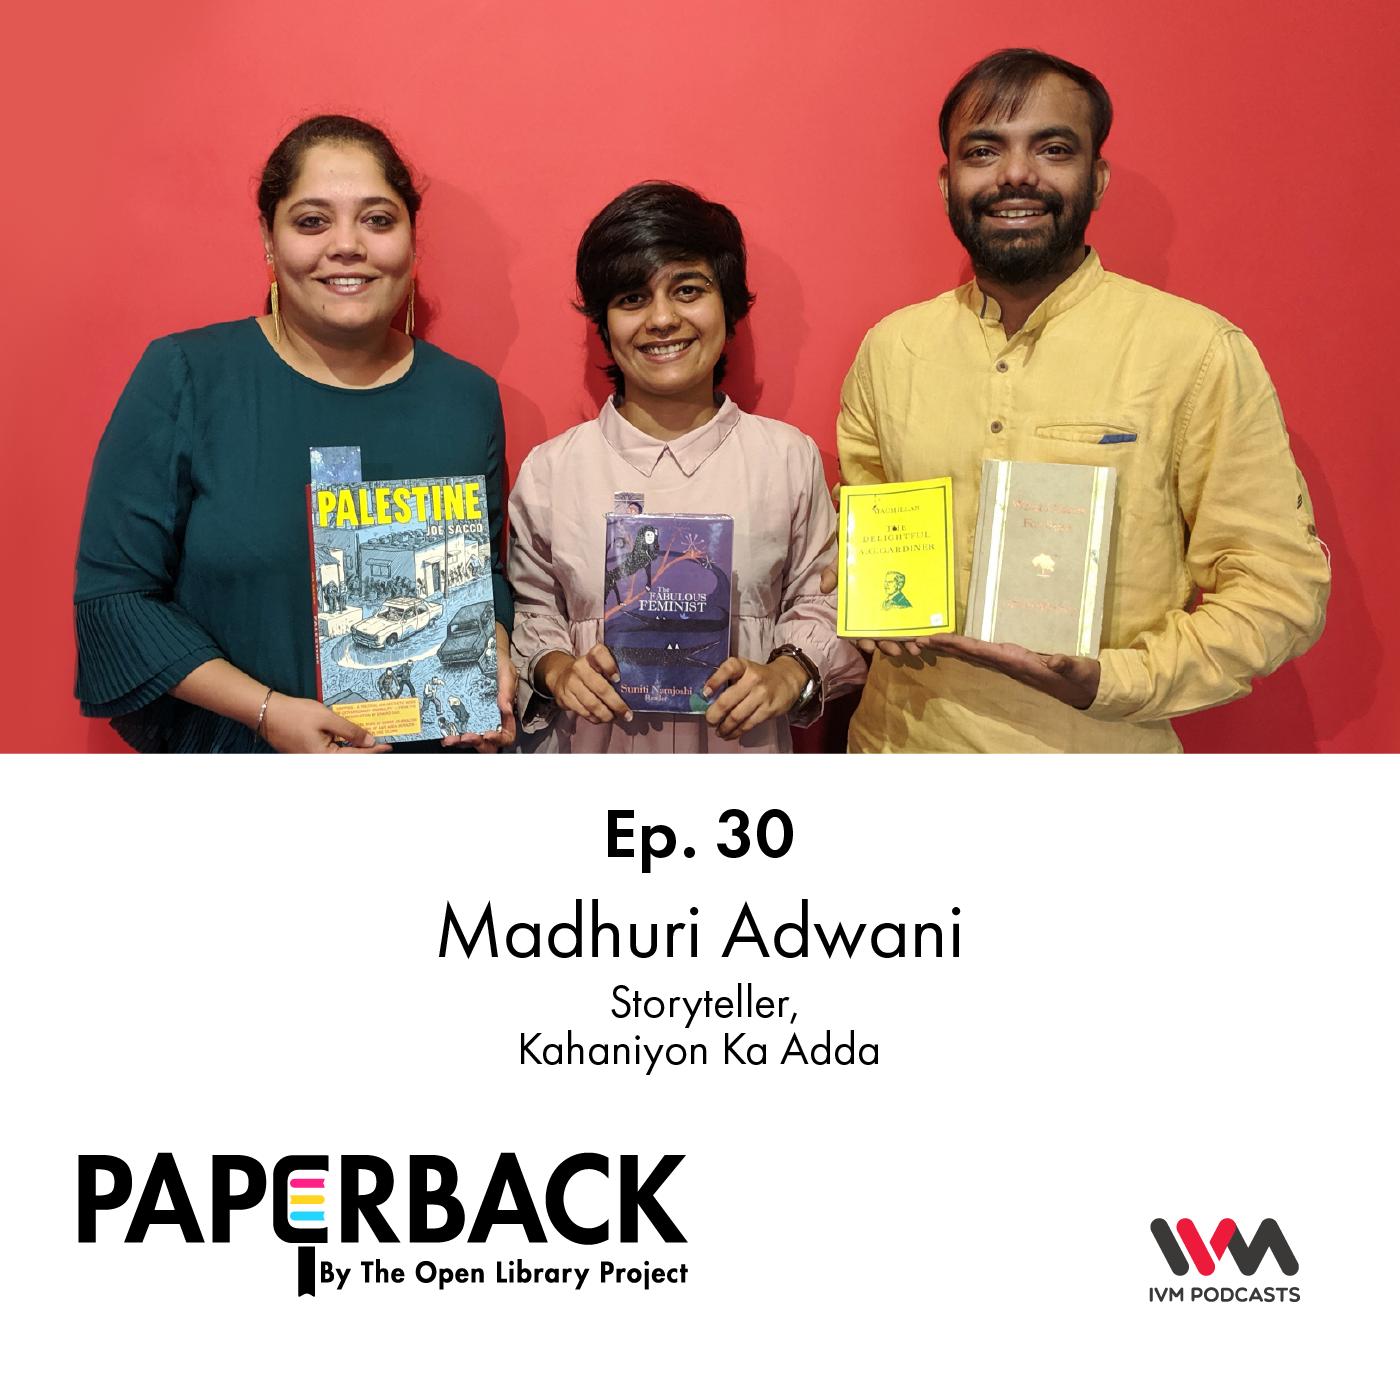 Ep. 30: Madhuri Adwani